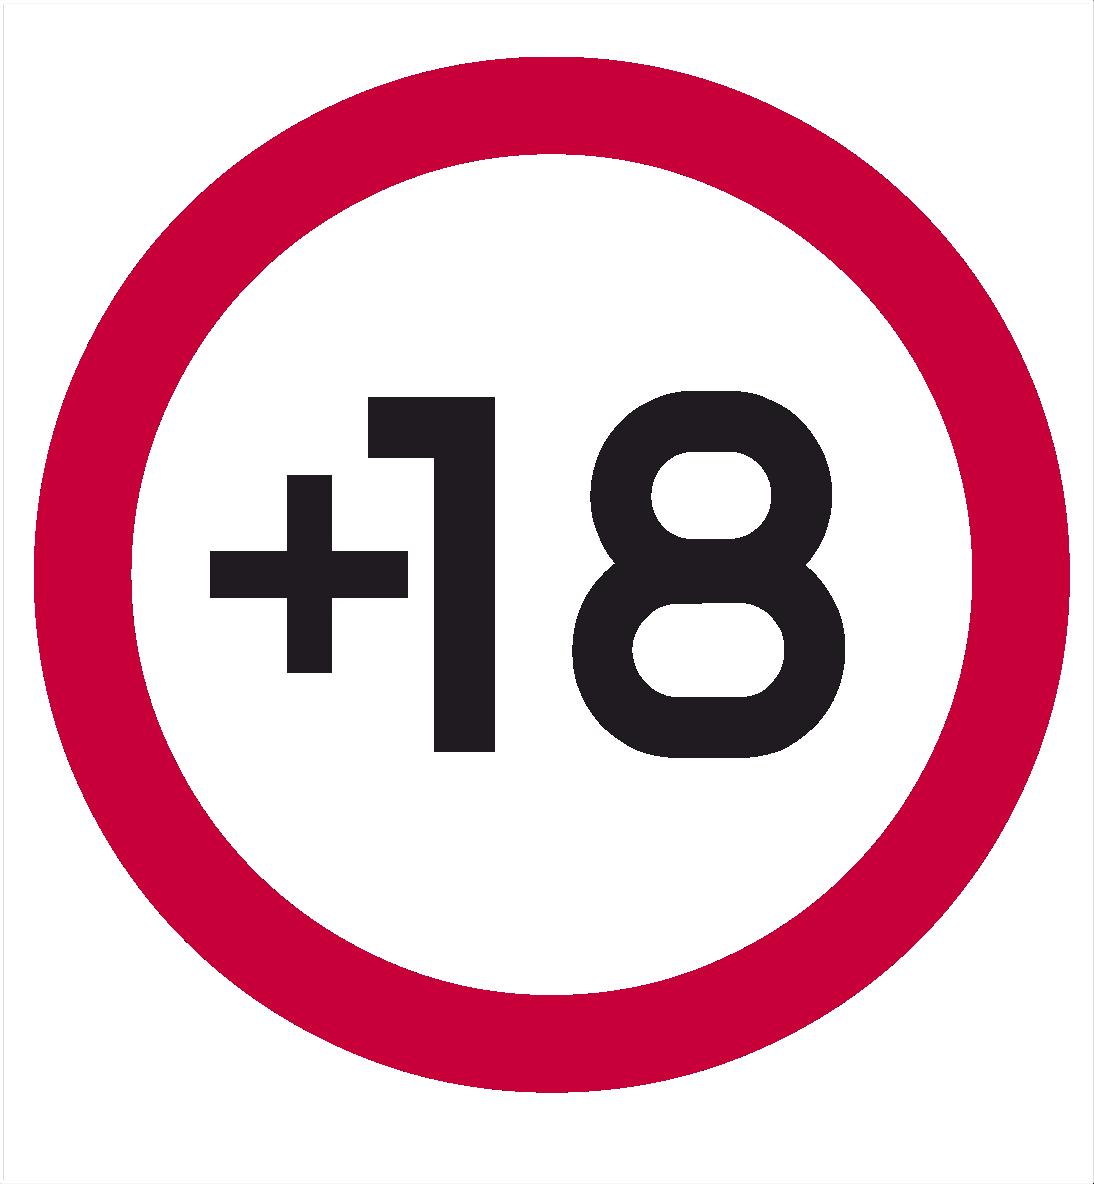 PLUS 18 - Adult